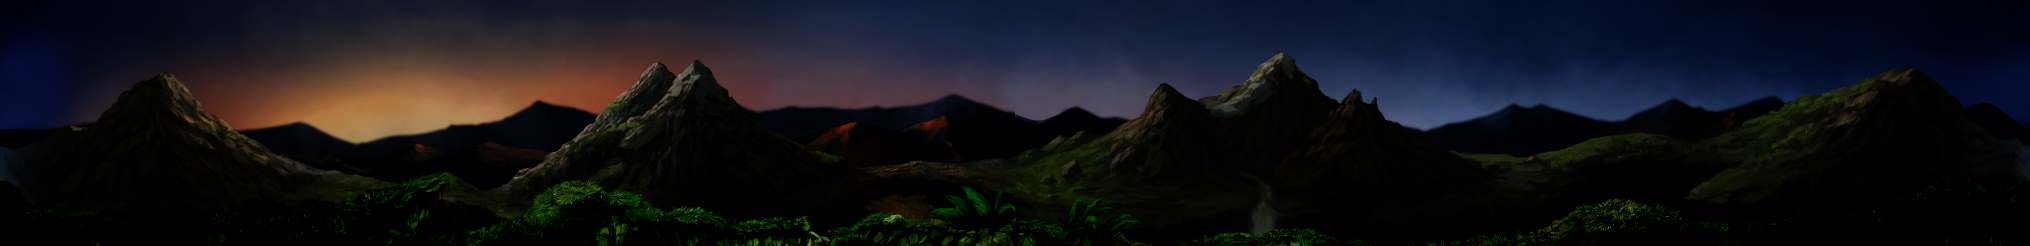 bkg twilight